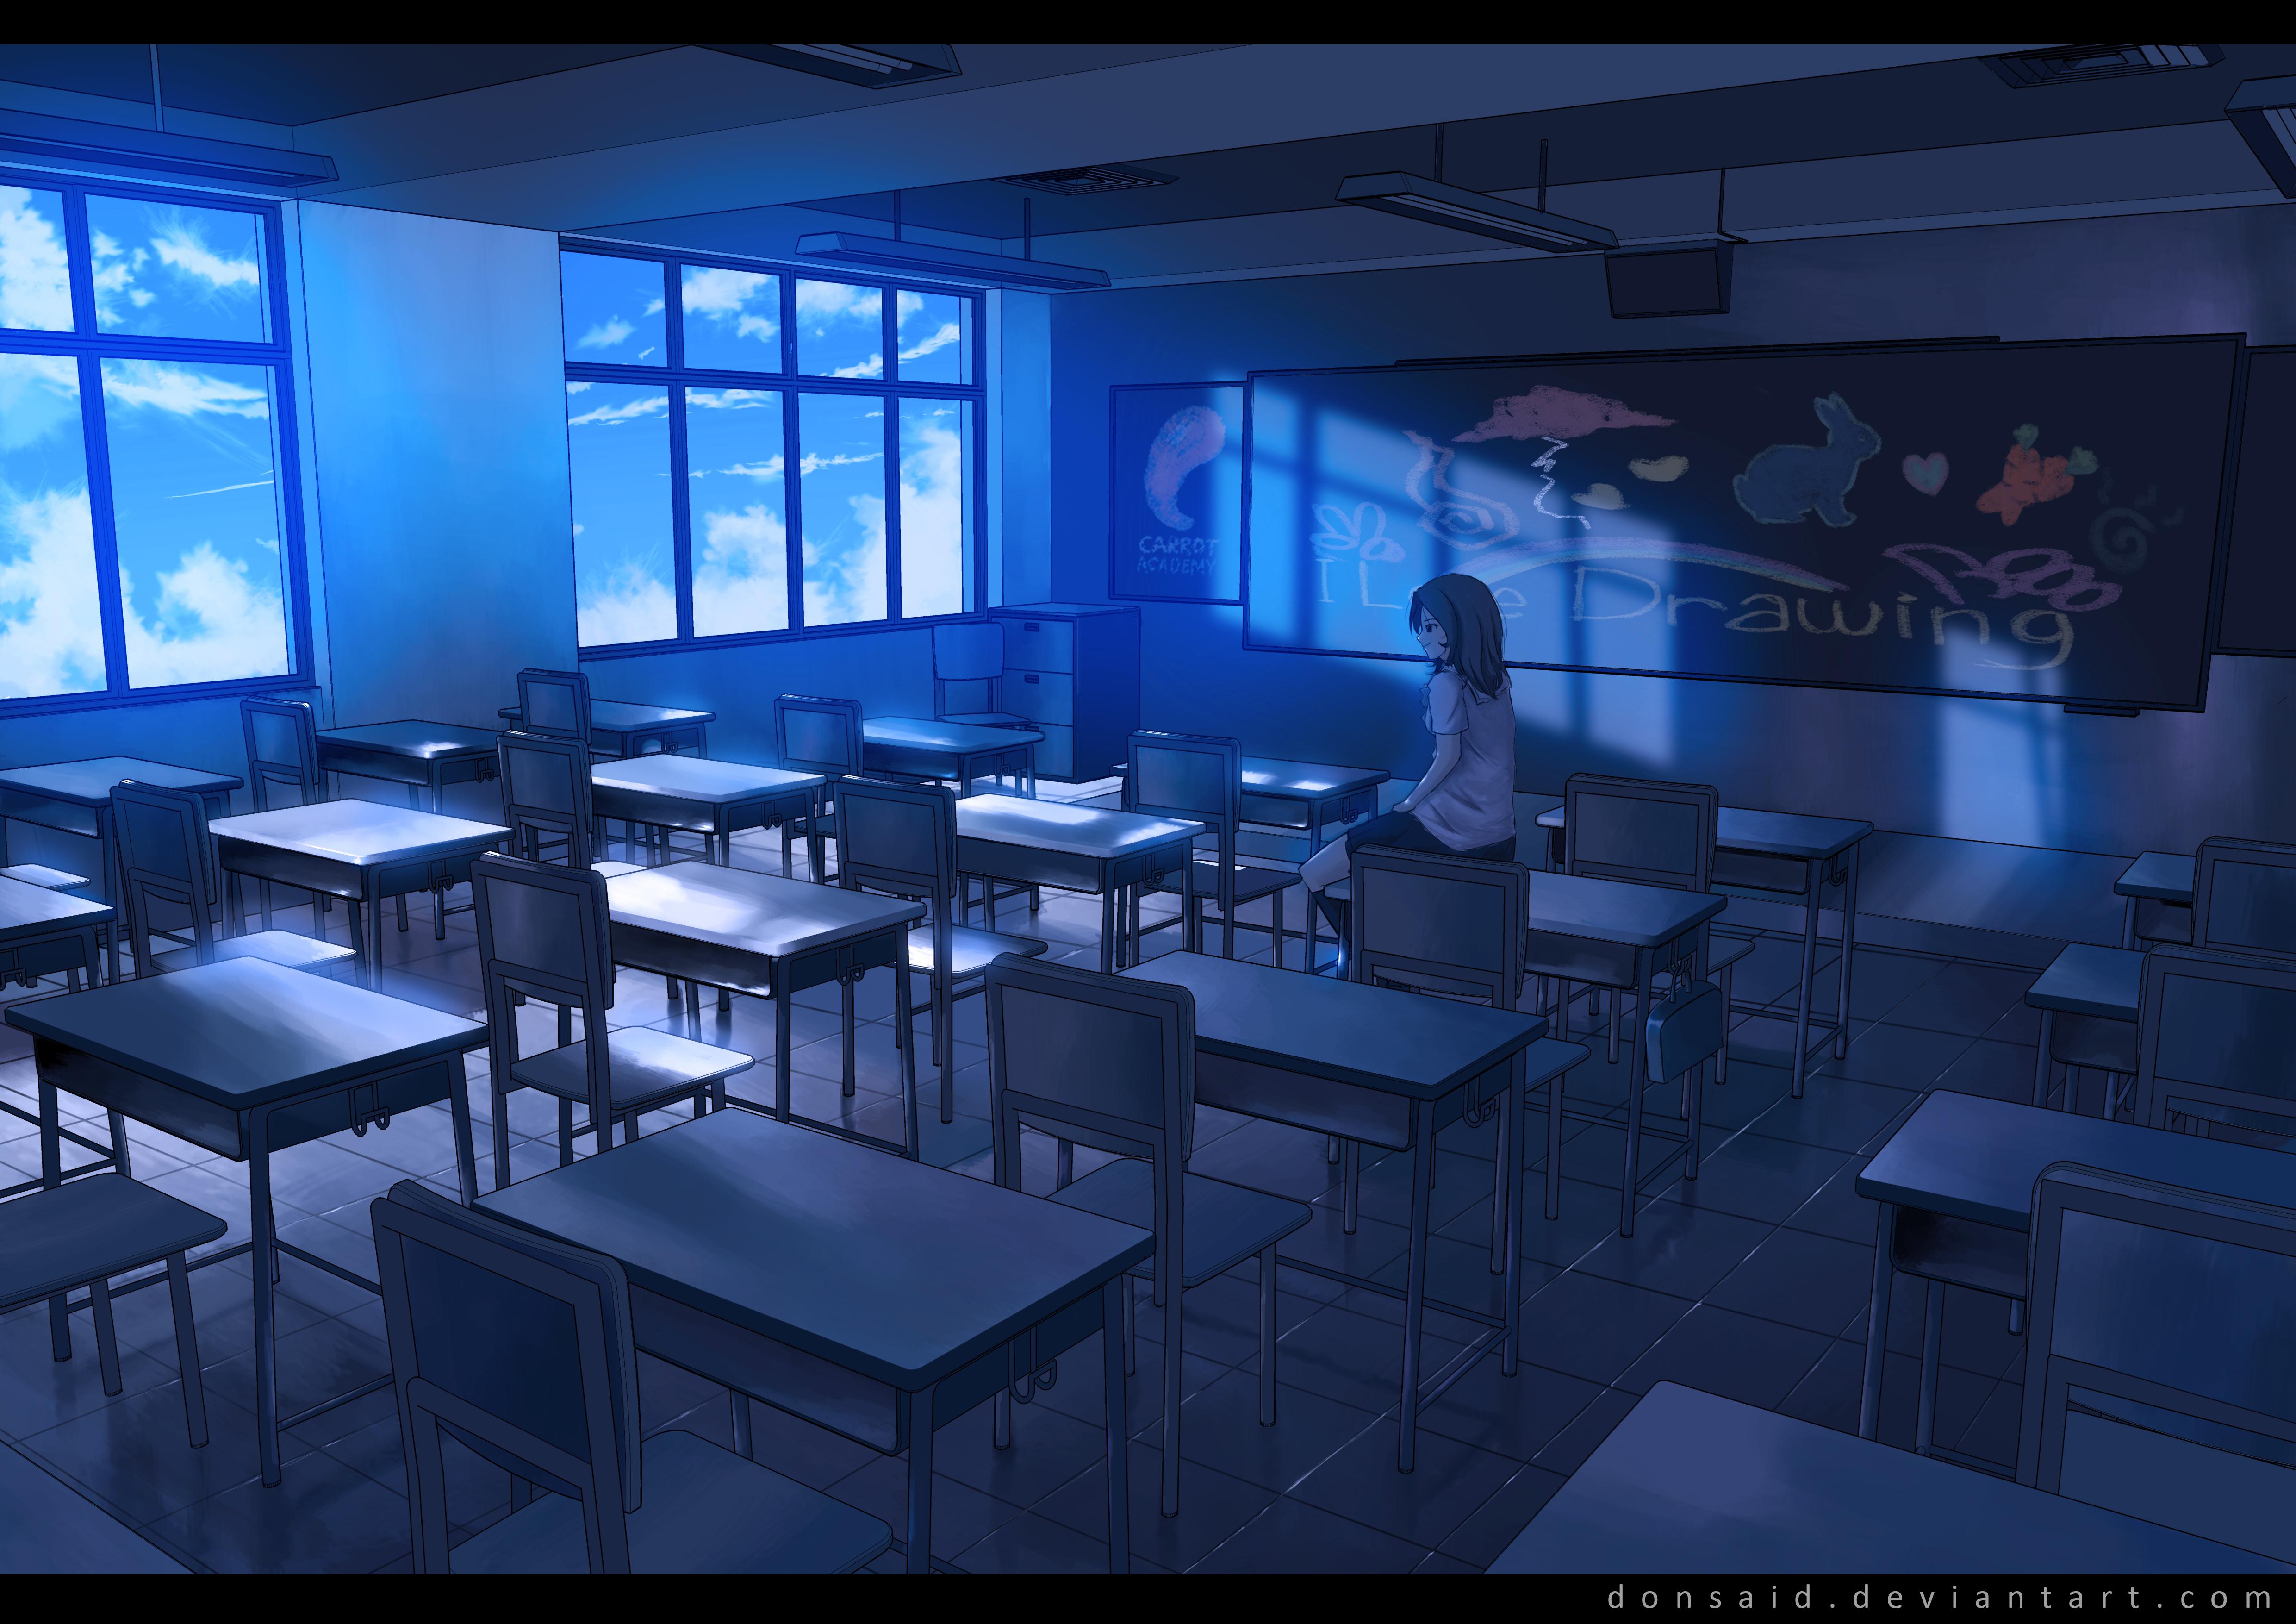 Blue Sky Classroom 4k Ultra HD Wallpaper   Background ...